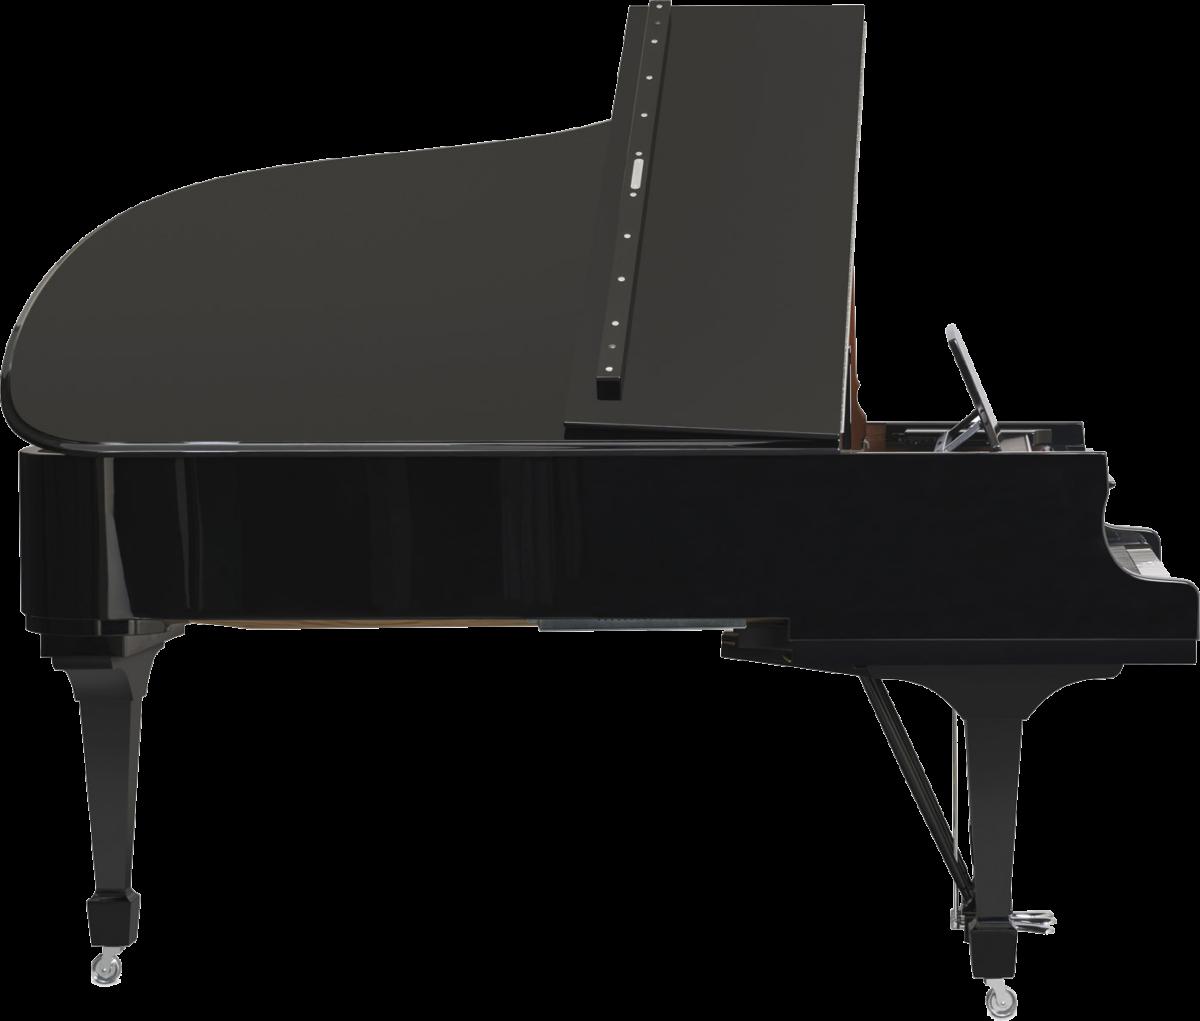 piano-cola-steinway-sons-b211-spirio-artesanal-165th-anniversary-edicion-especial-nuevo-negro-caoba-sapeli-lateral-02